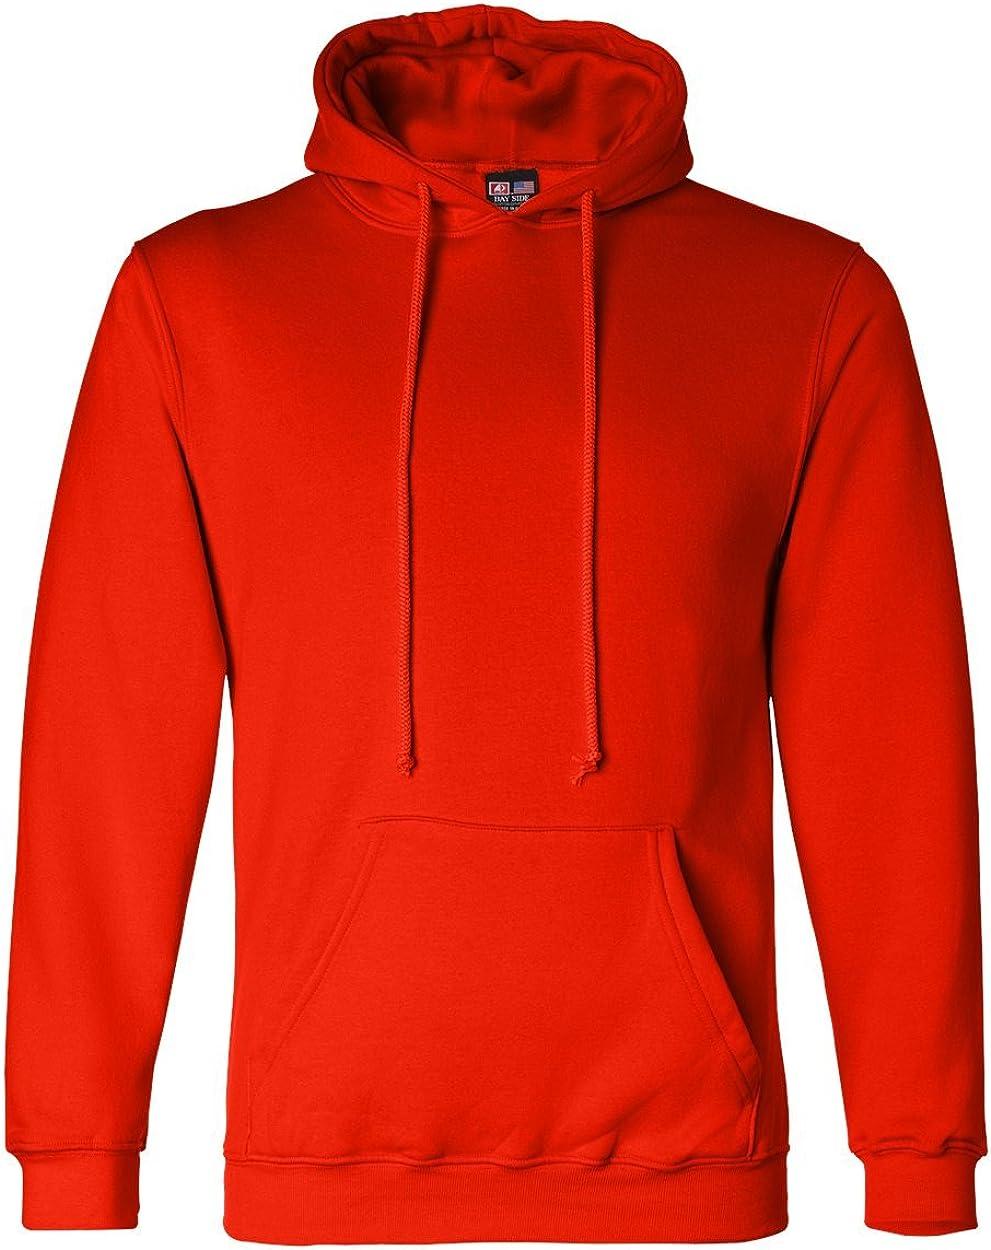 Bayside Apparel Pullover Hooded Sweatshirt (BA960)